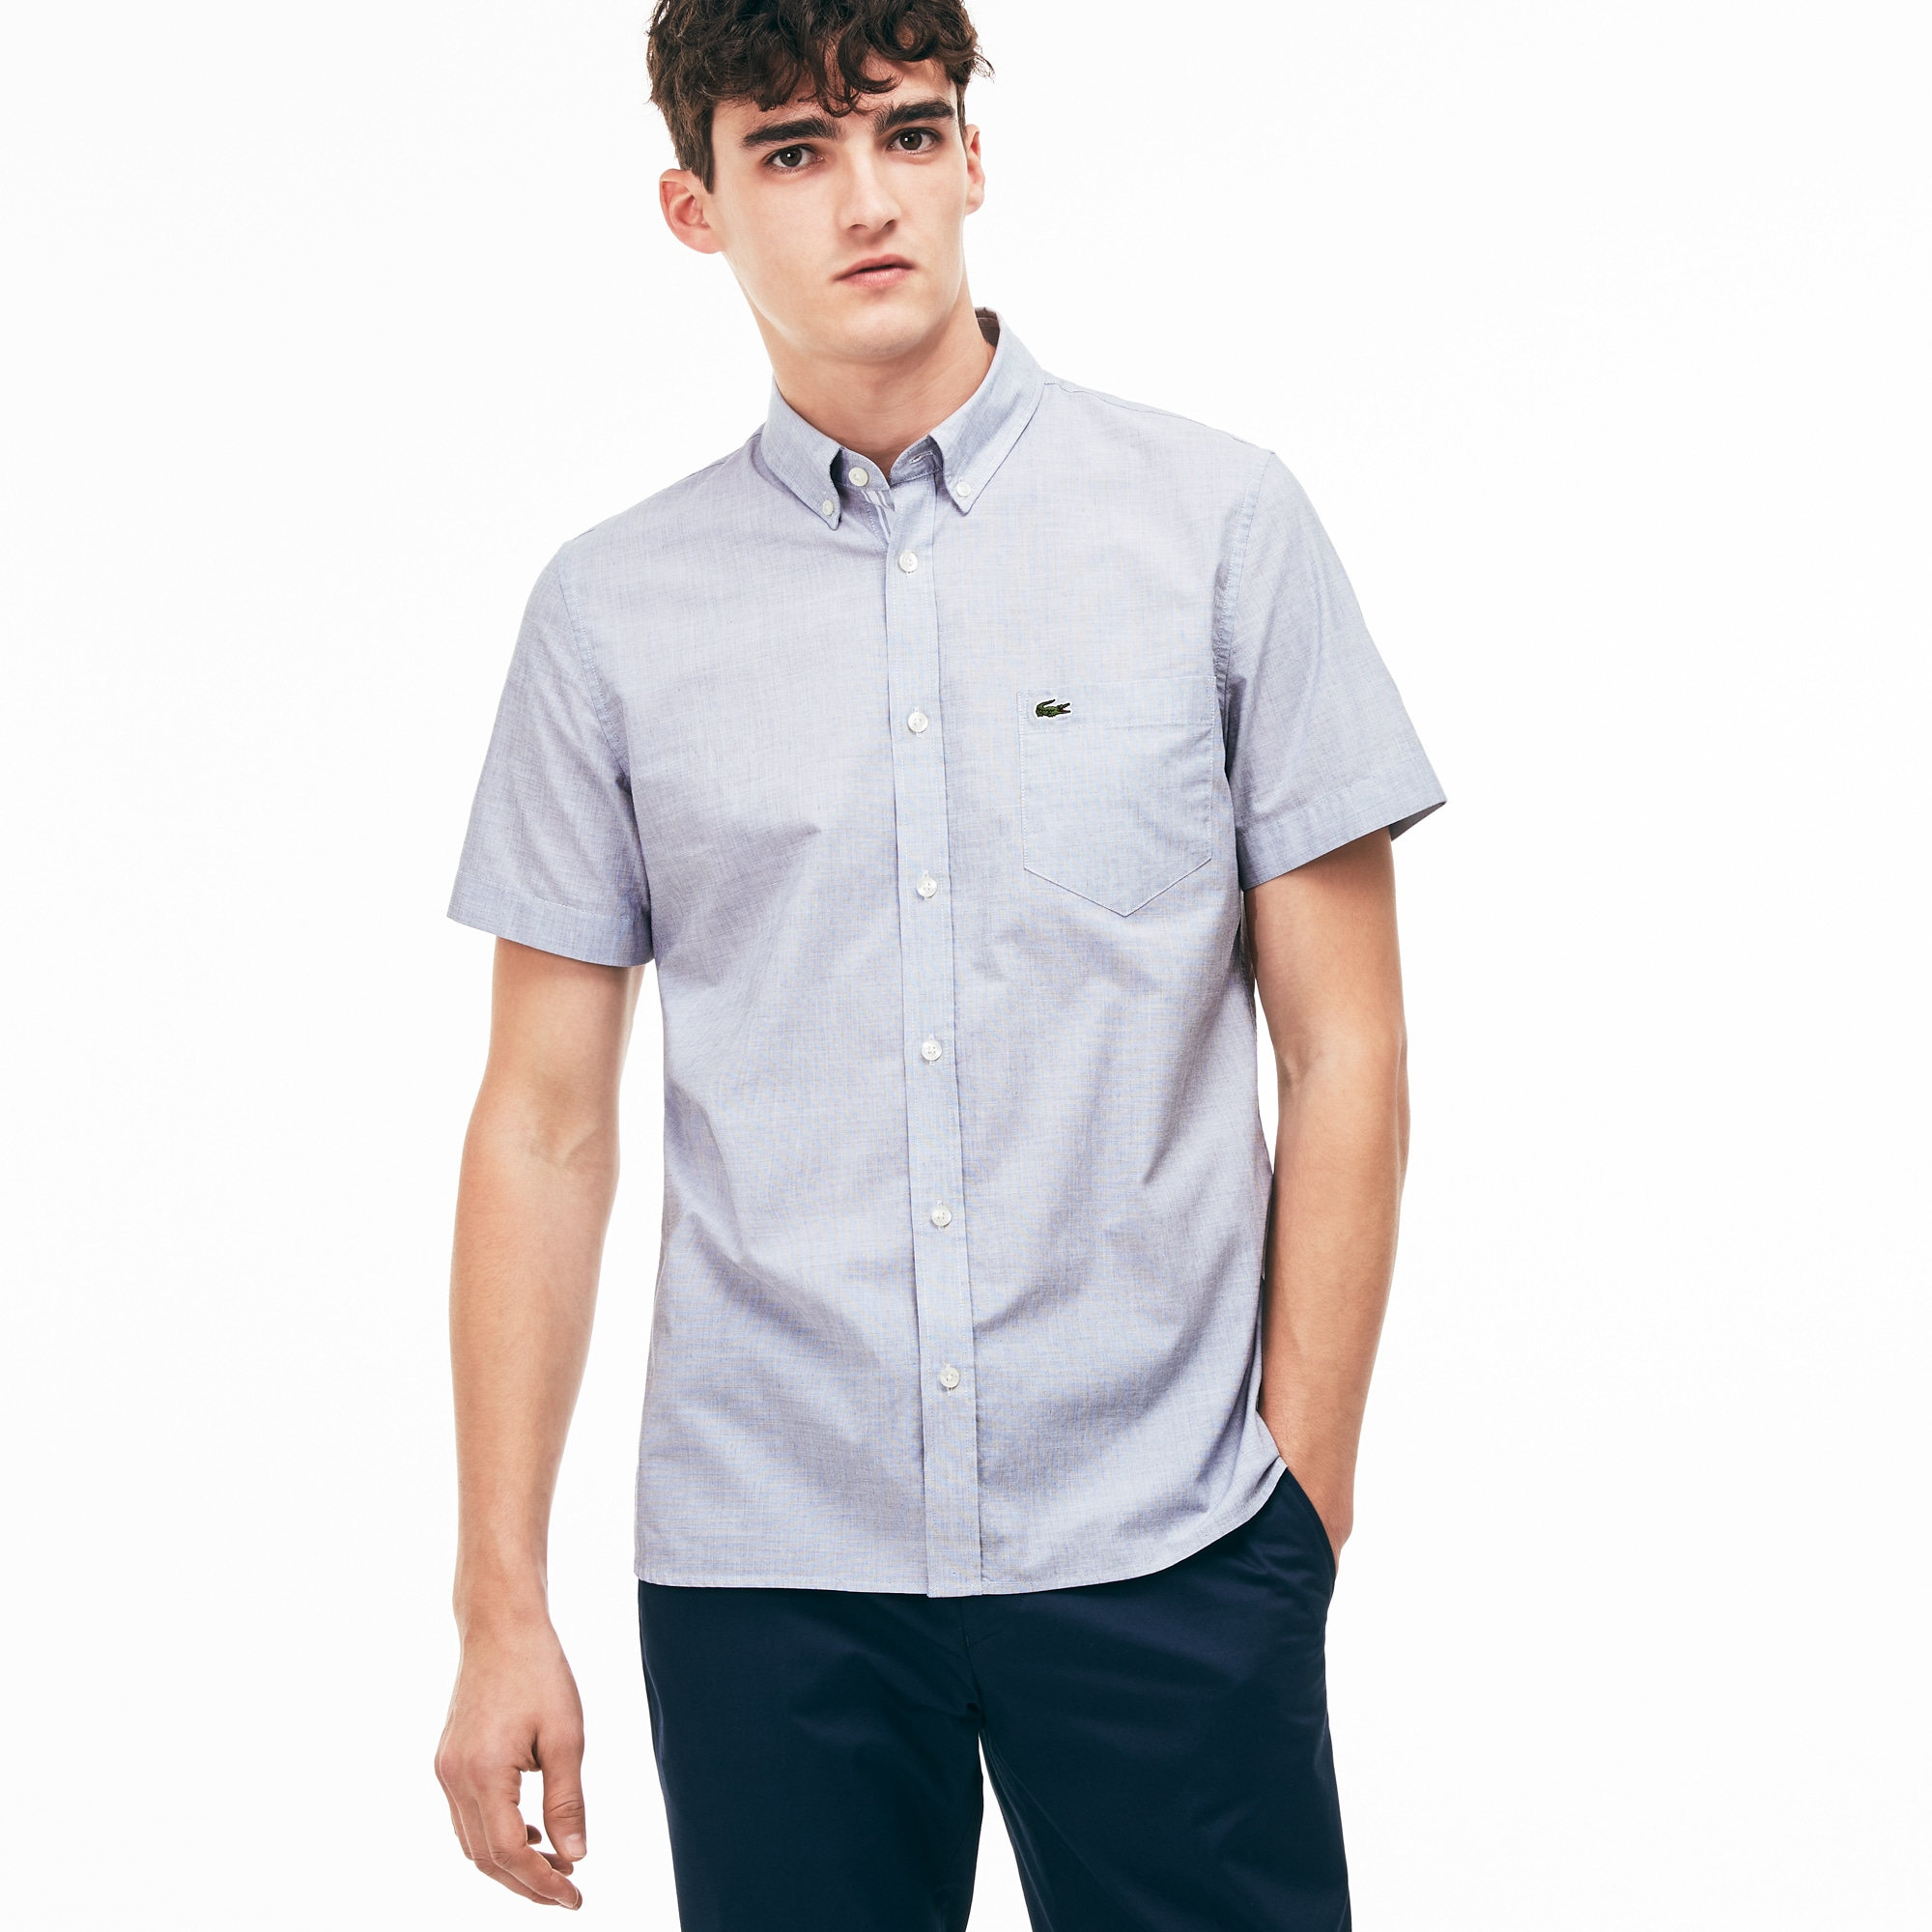 877dc708268 Camisas de manga curta - Masculinas